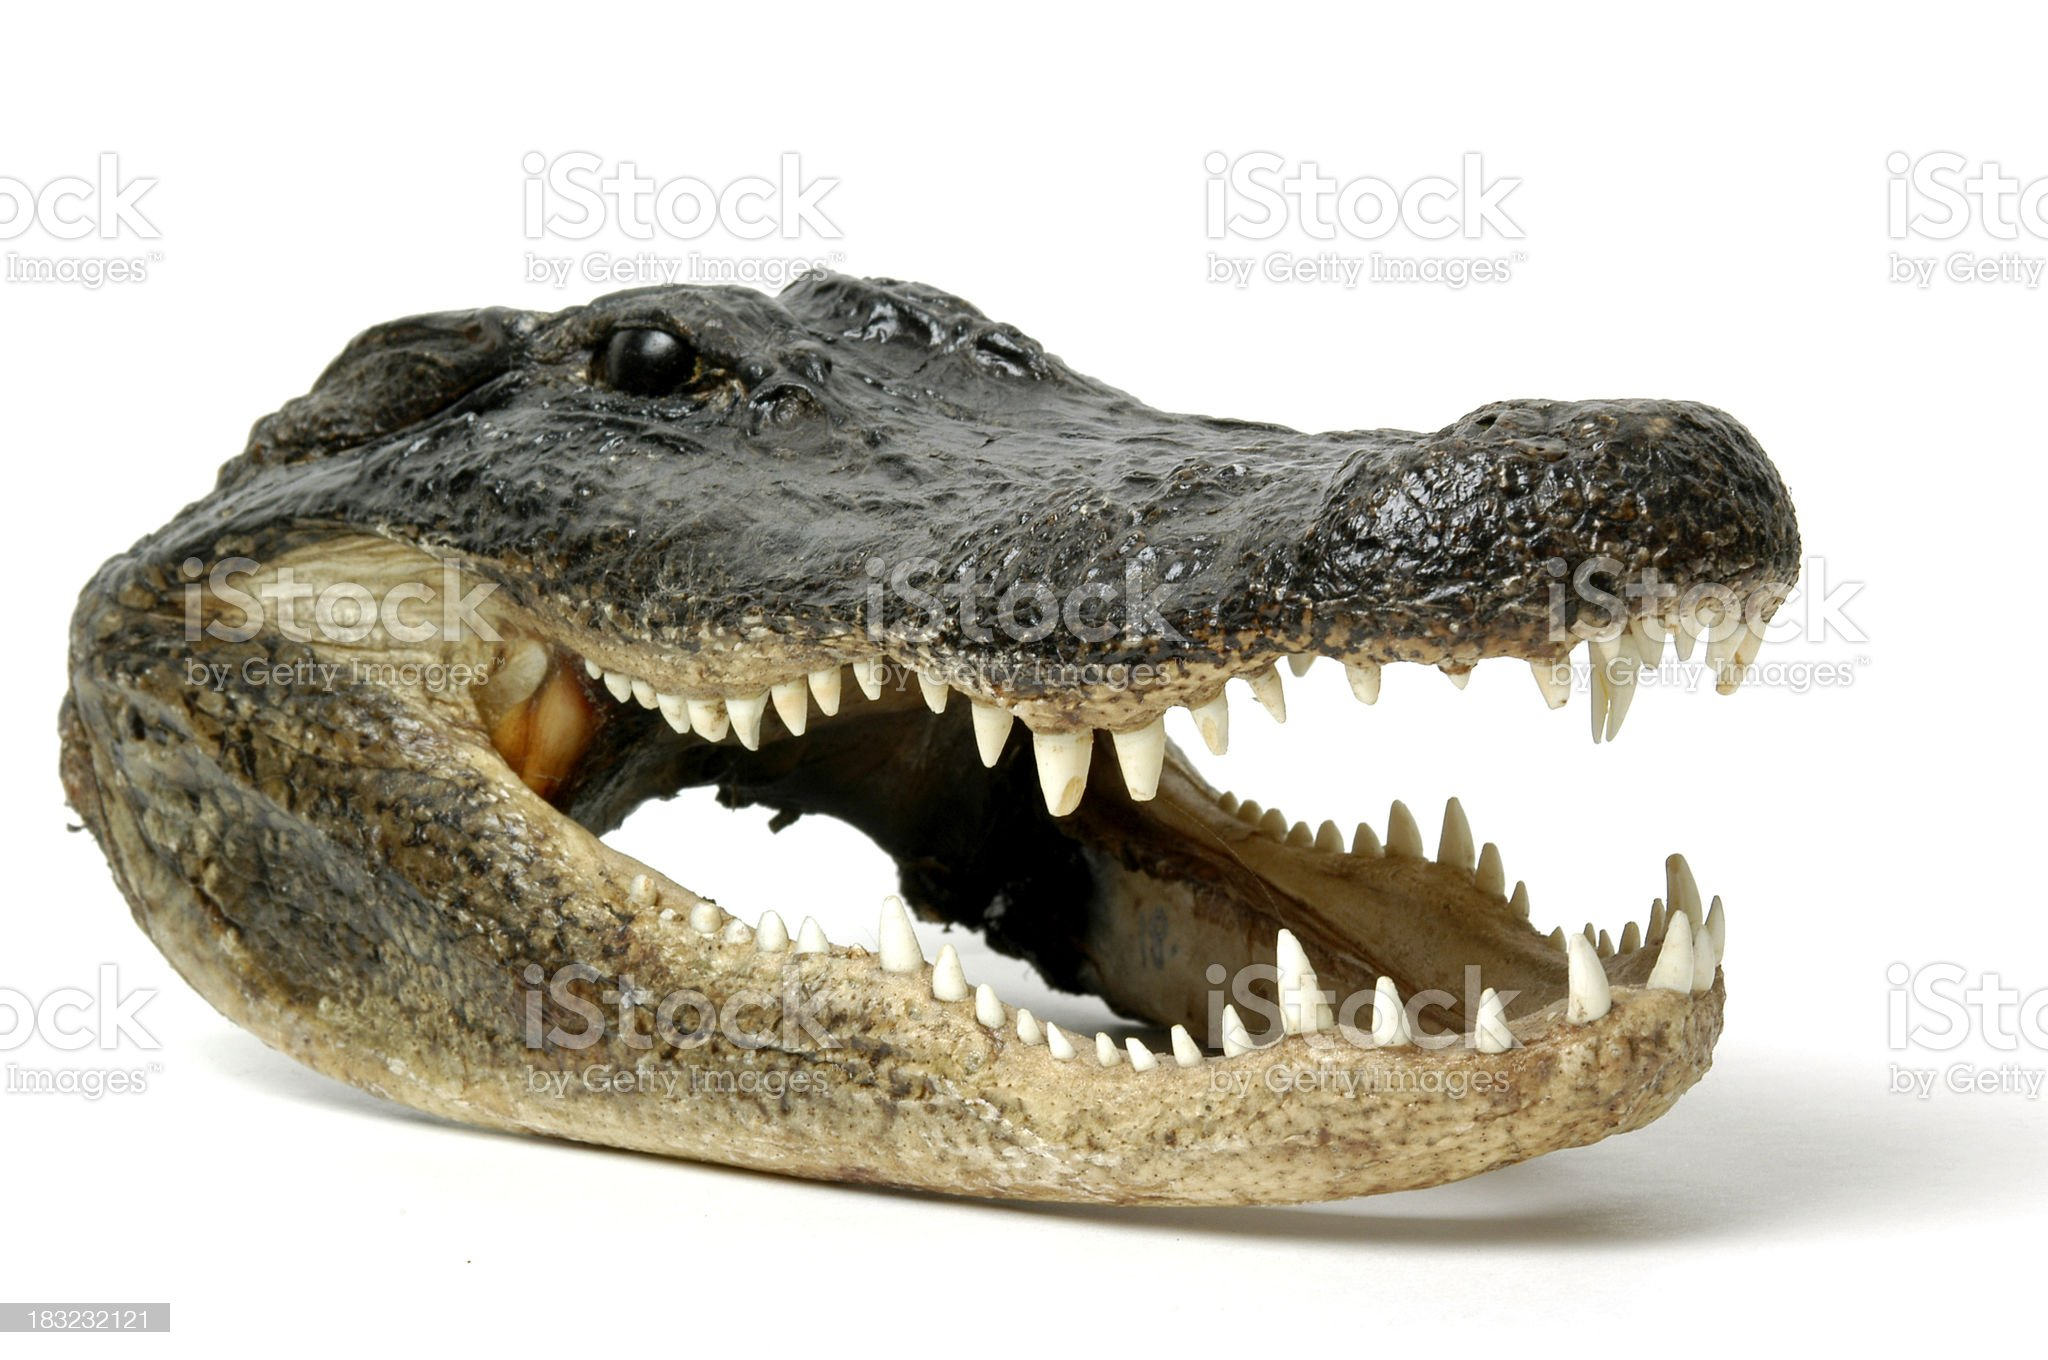 Smiling Alligator royalty-free stock photo